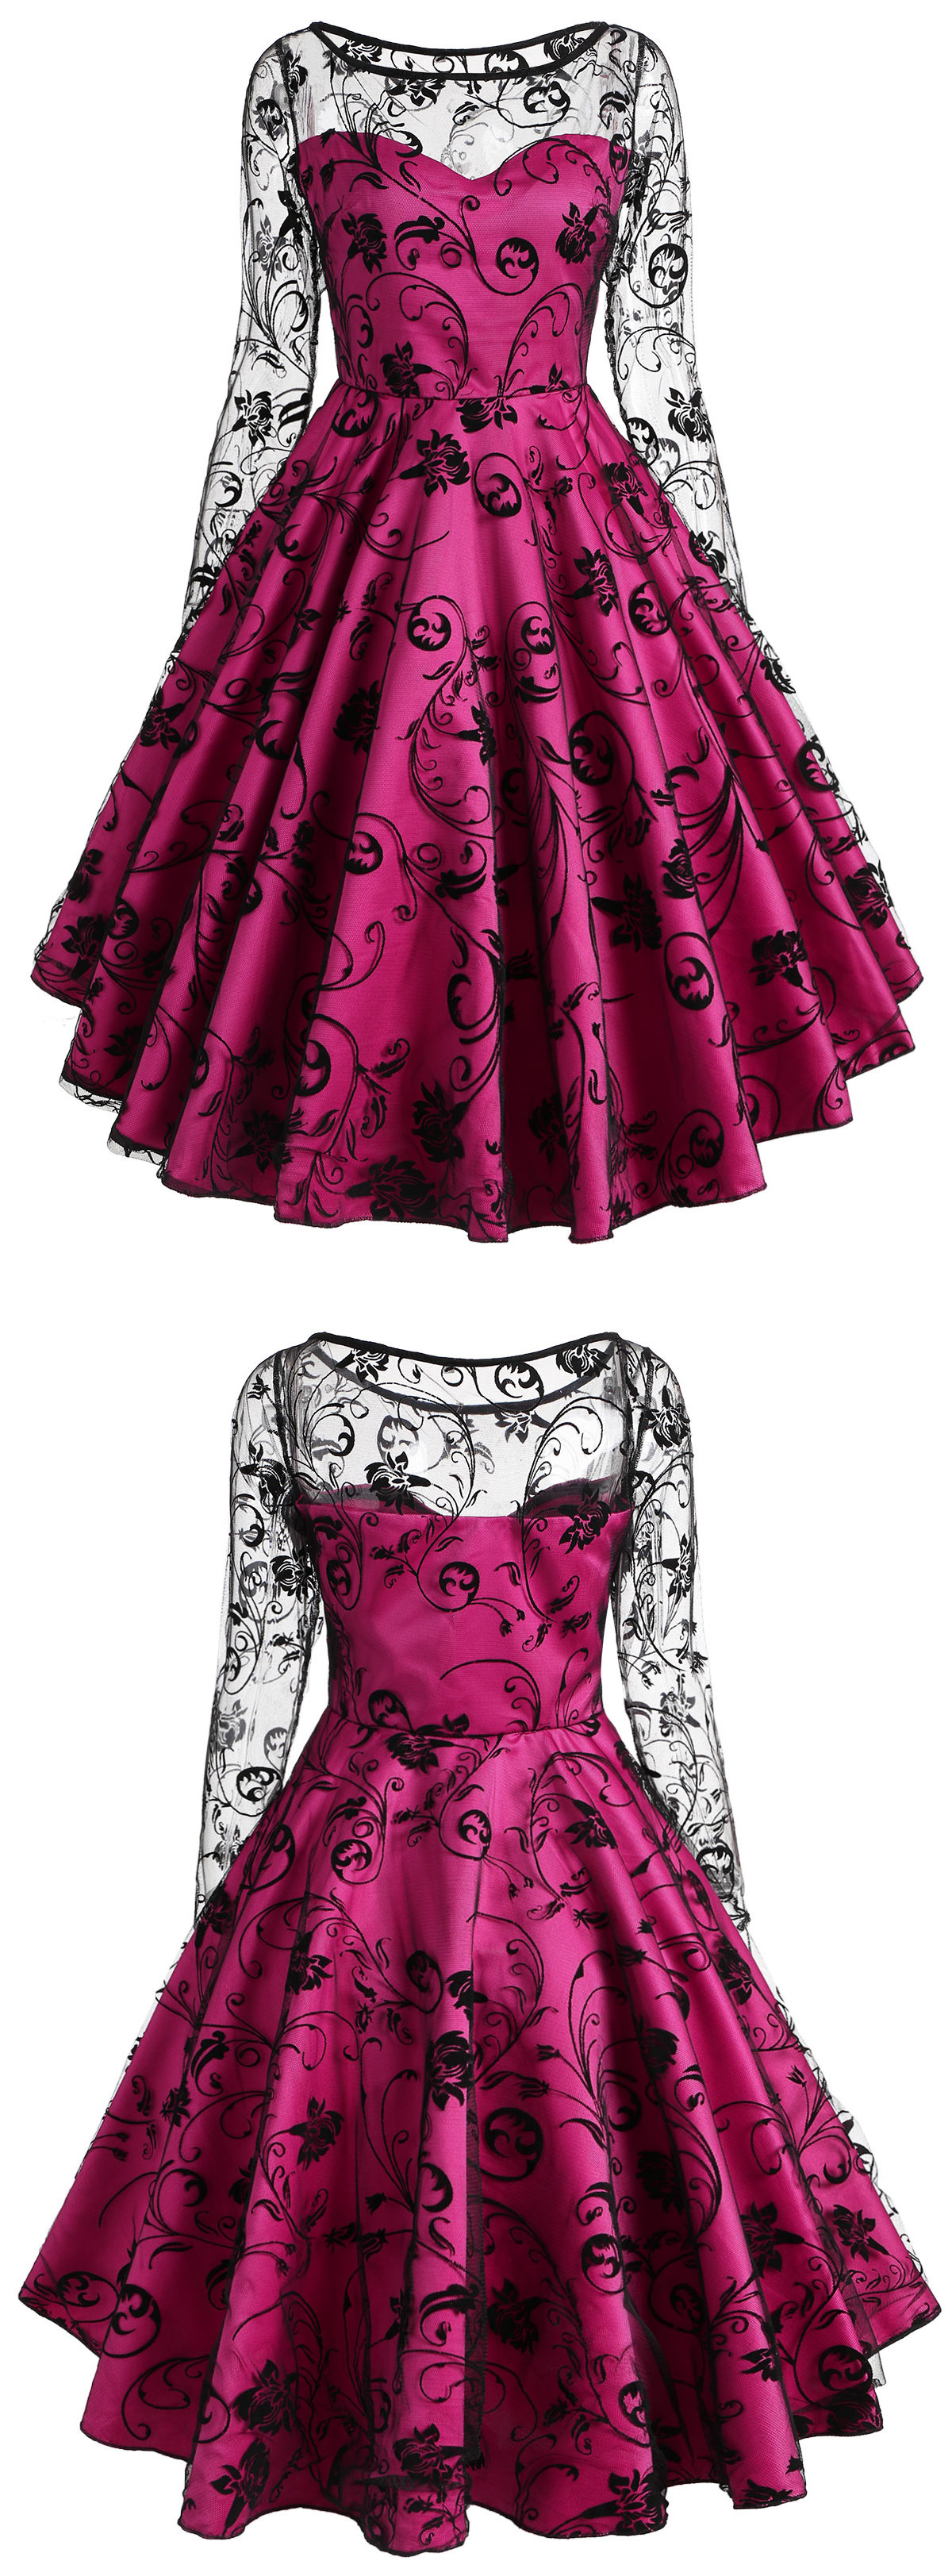 Valentine Lace Overlay Vintage Dress 17 72 Free